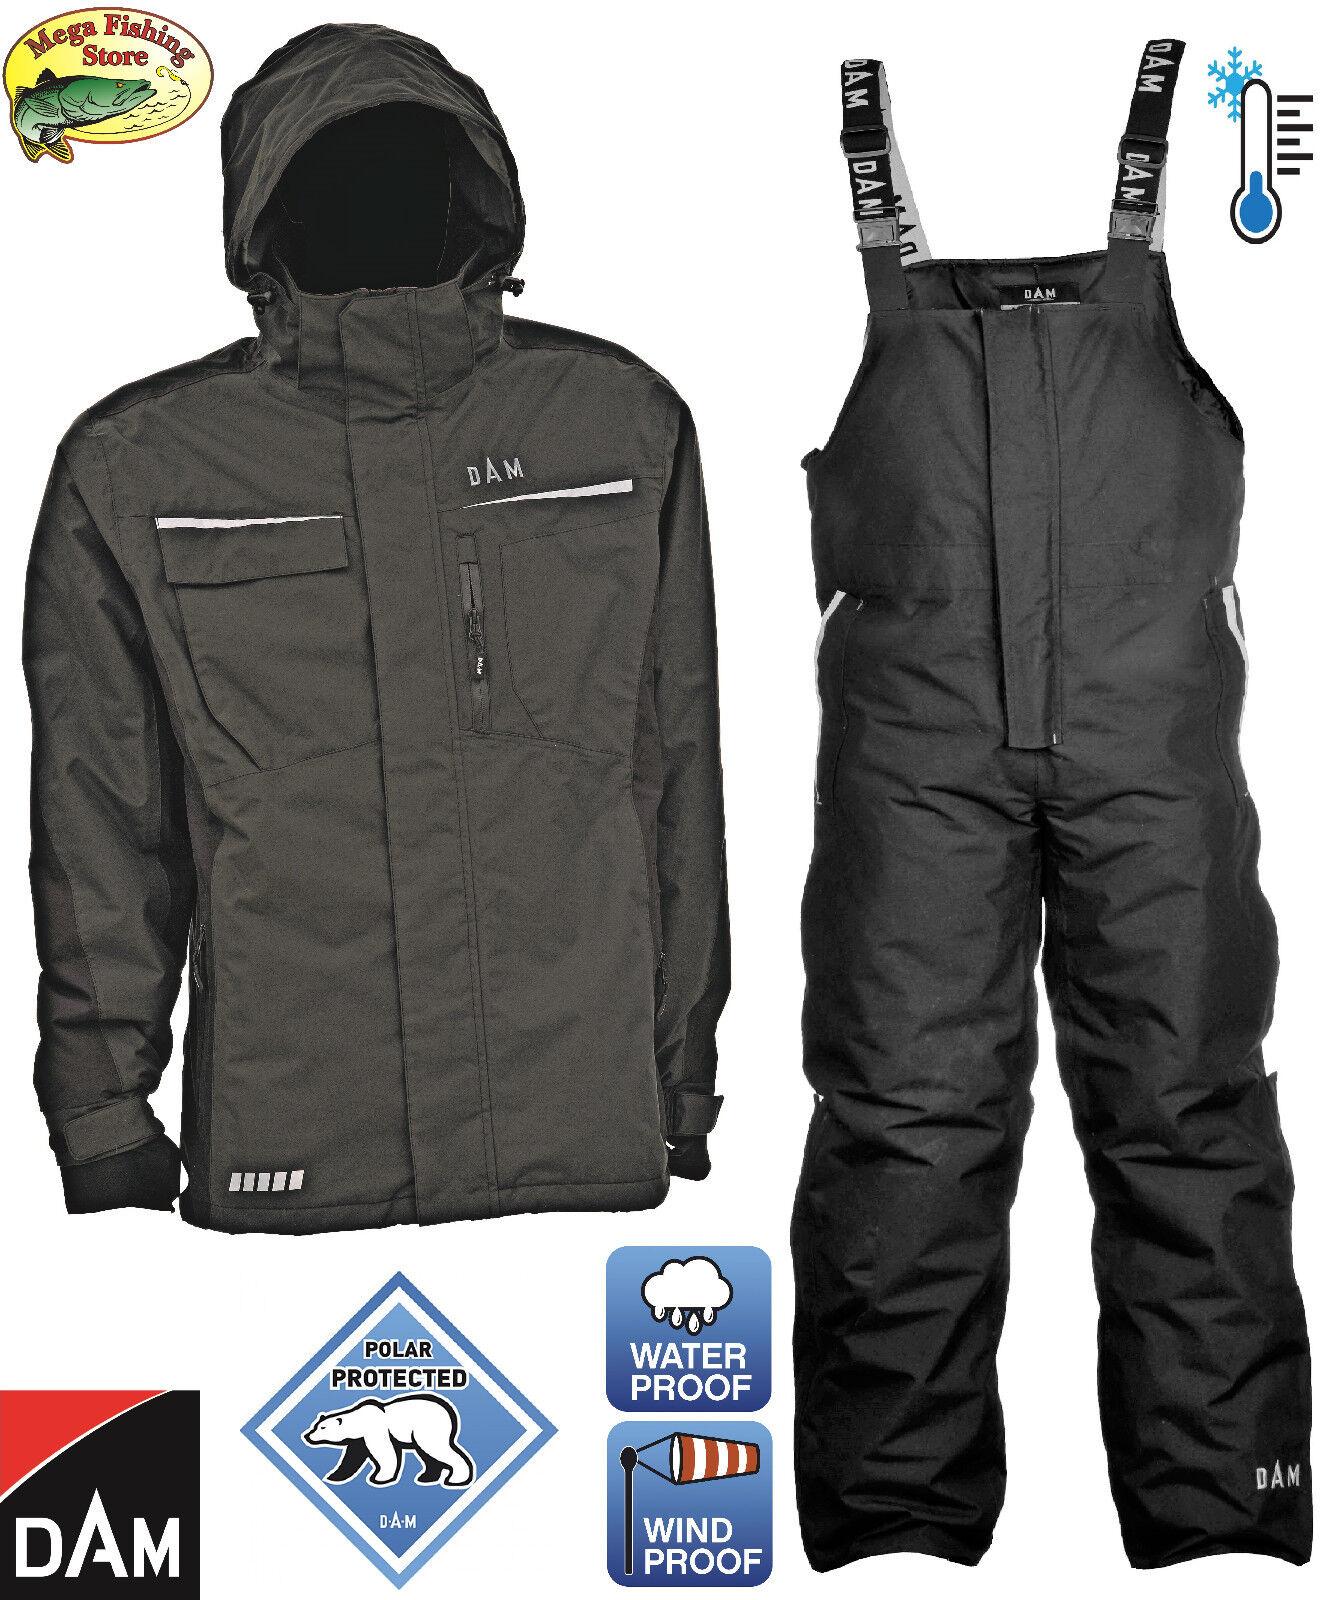 DAM Techni-Flex Thermoanzug Winteranzug Thermo Anzug Alle Größen Winterjacke Anzüge